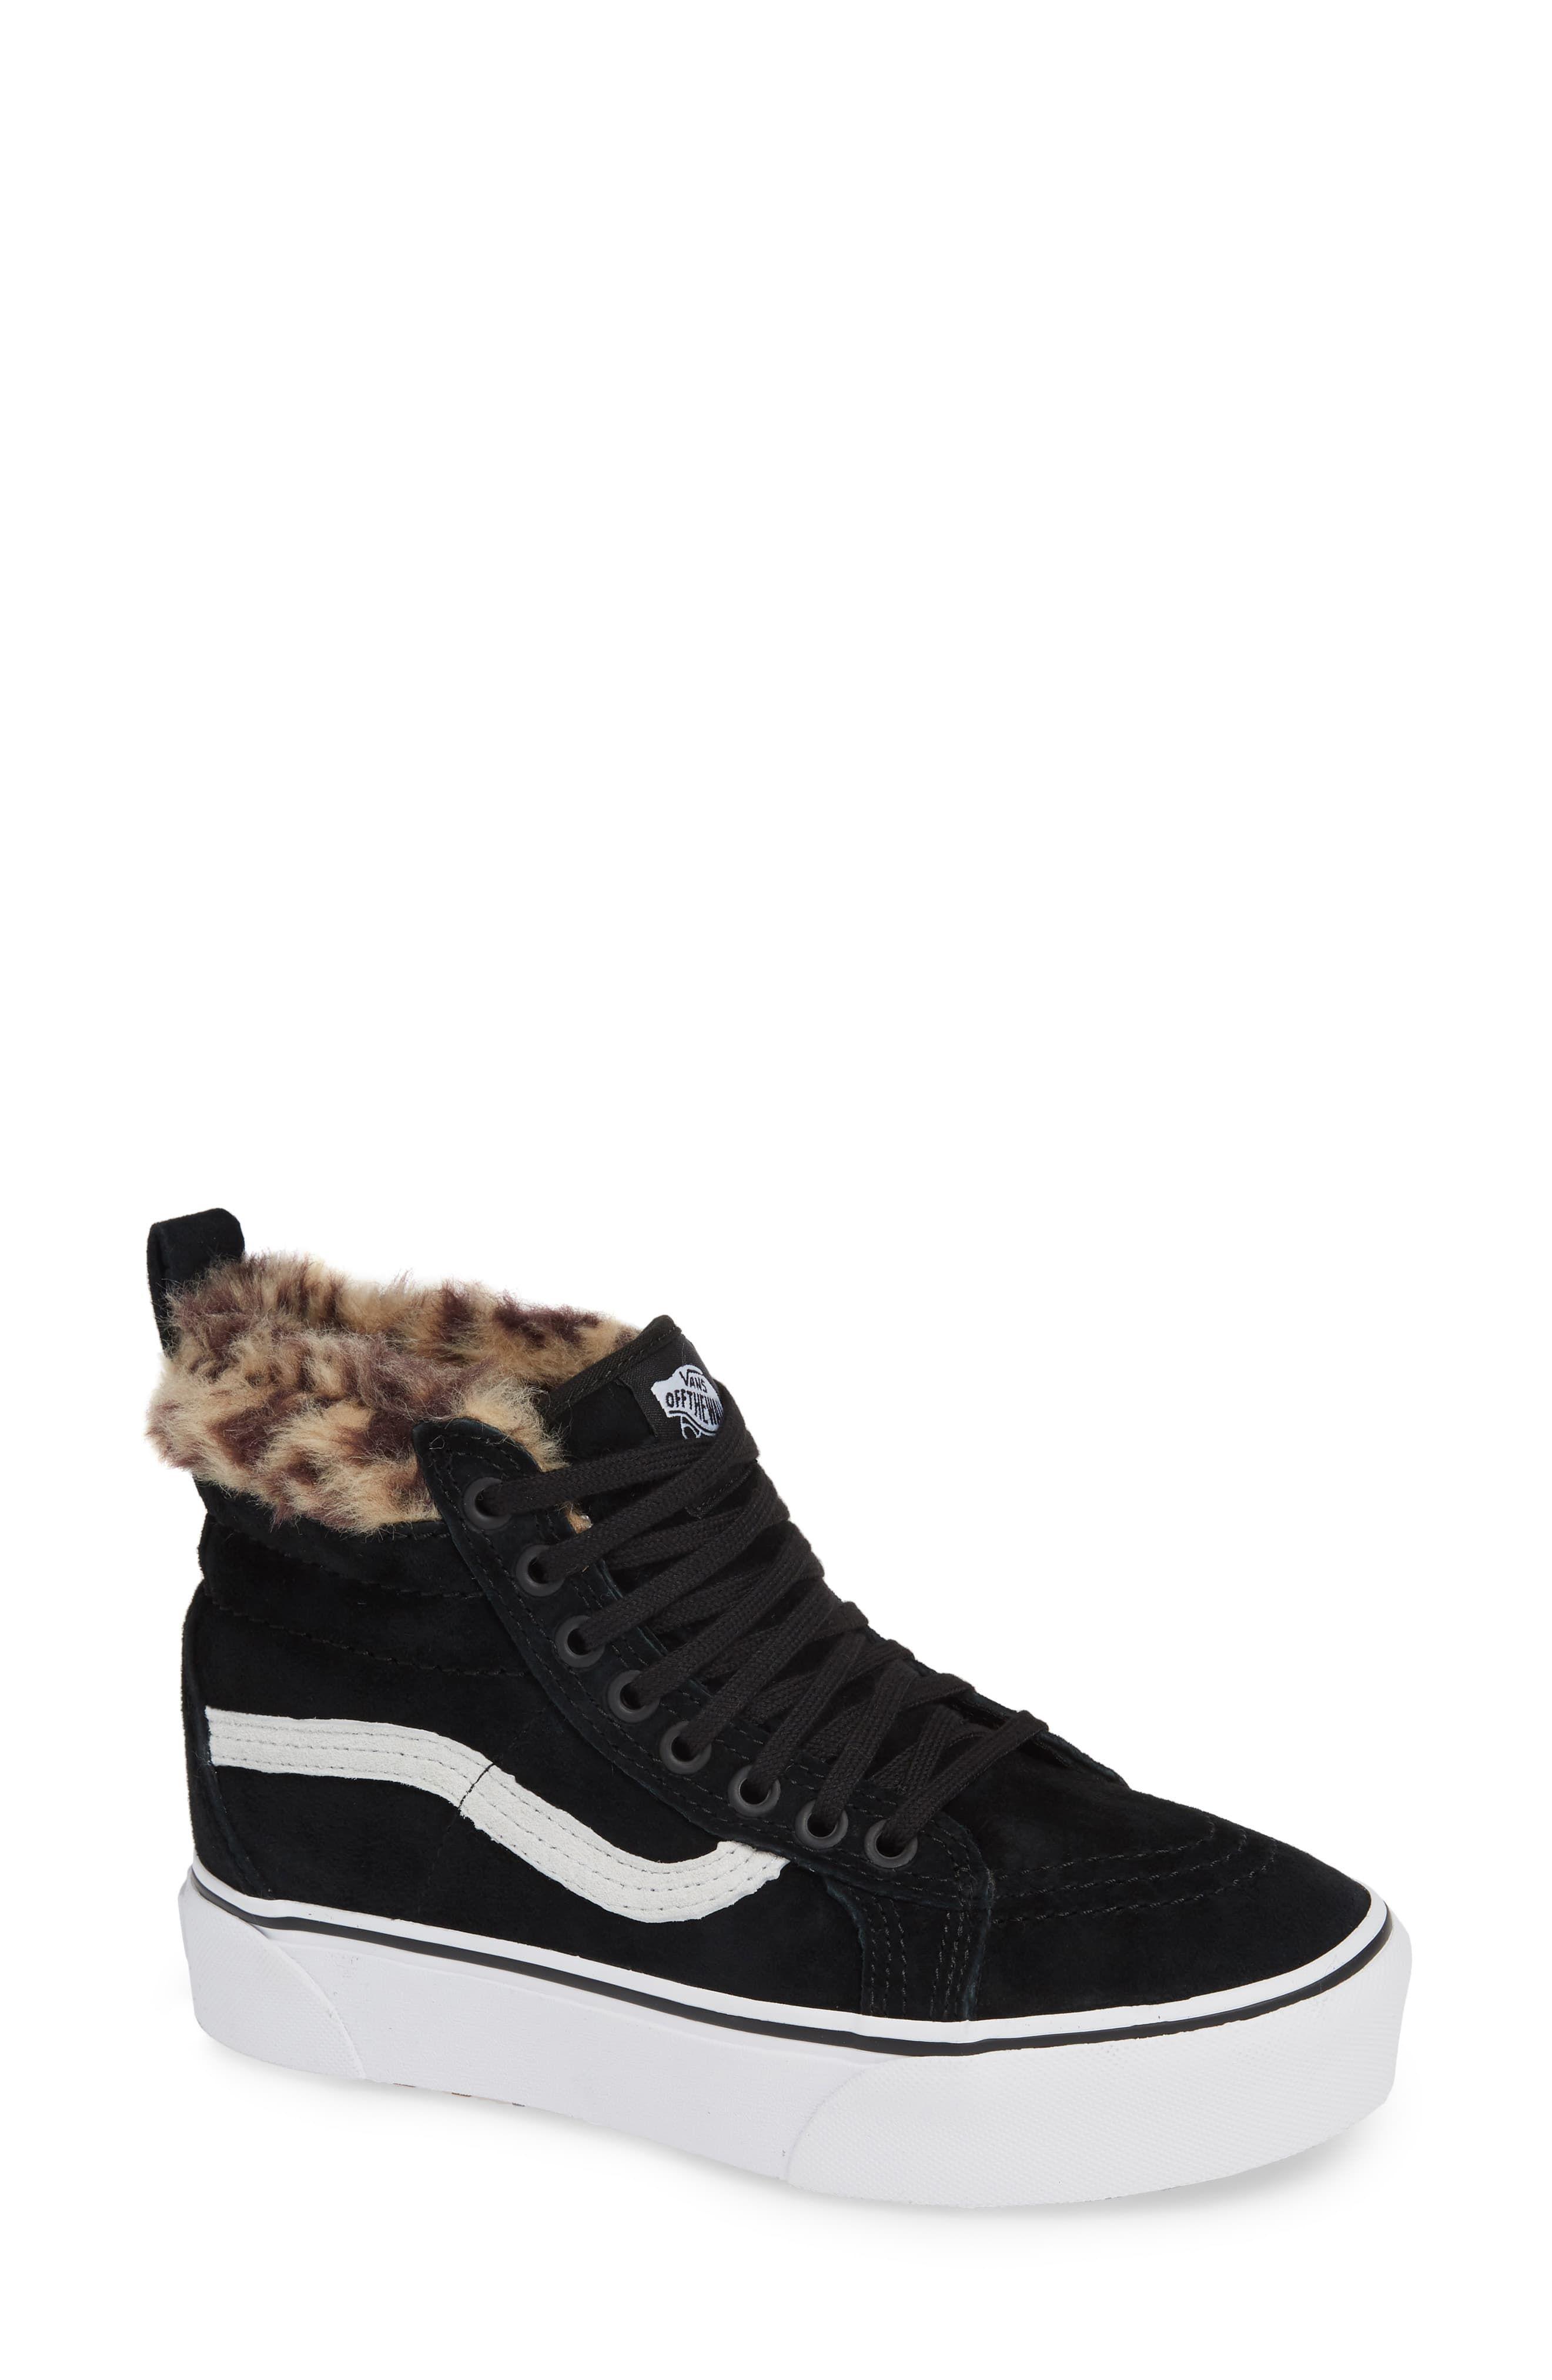 c29fec6b6 Women's Vans Sk8-Hi Faux Fur Lined Platform Sneaker, Size 7.5 M - Black